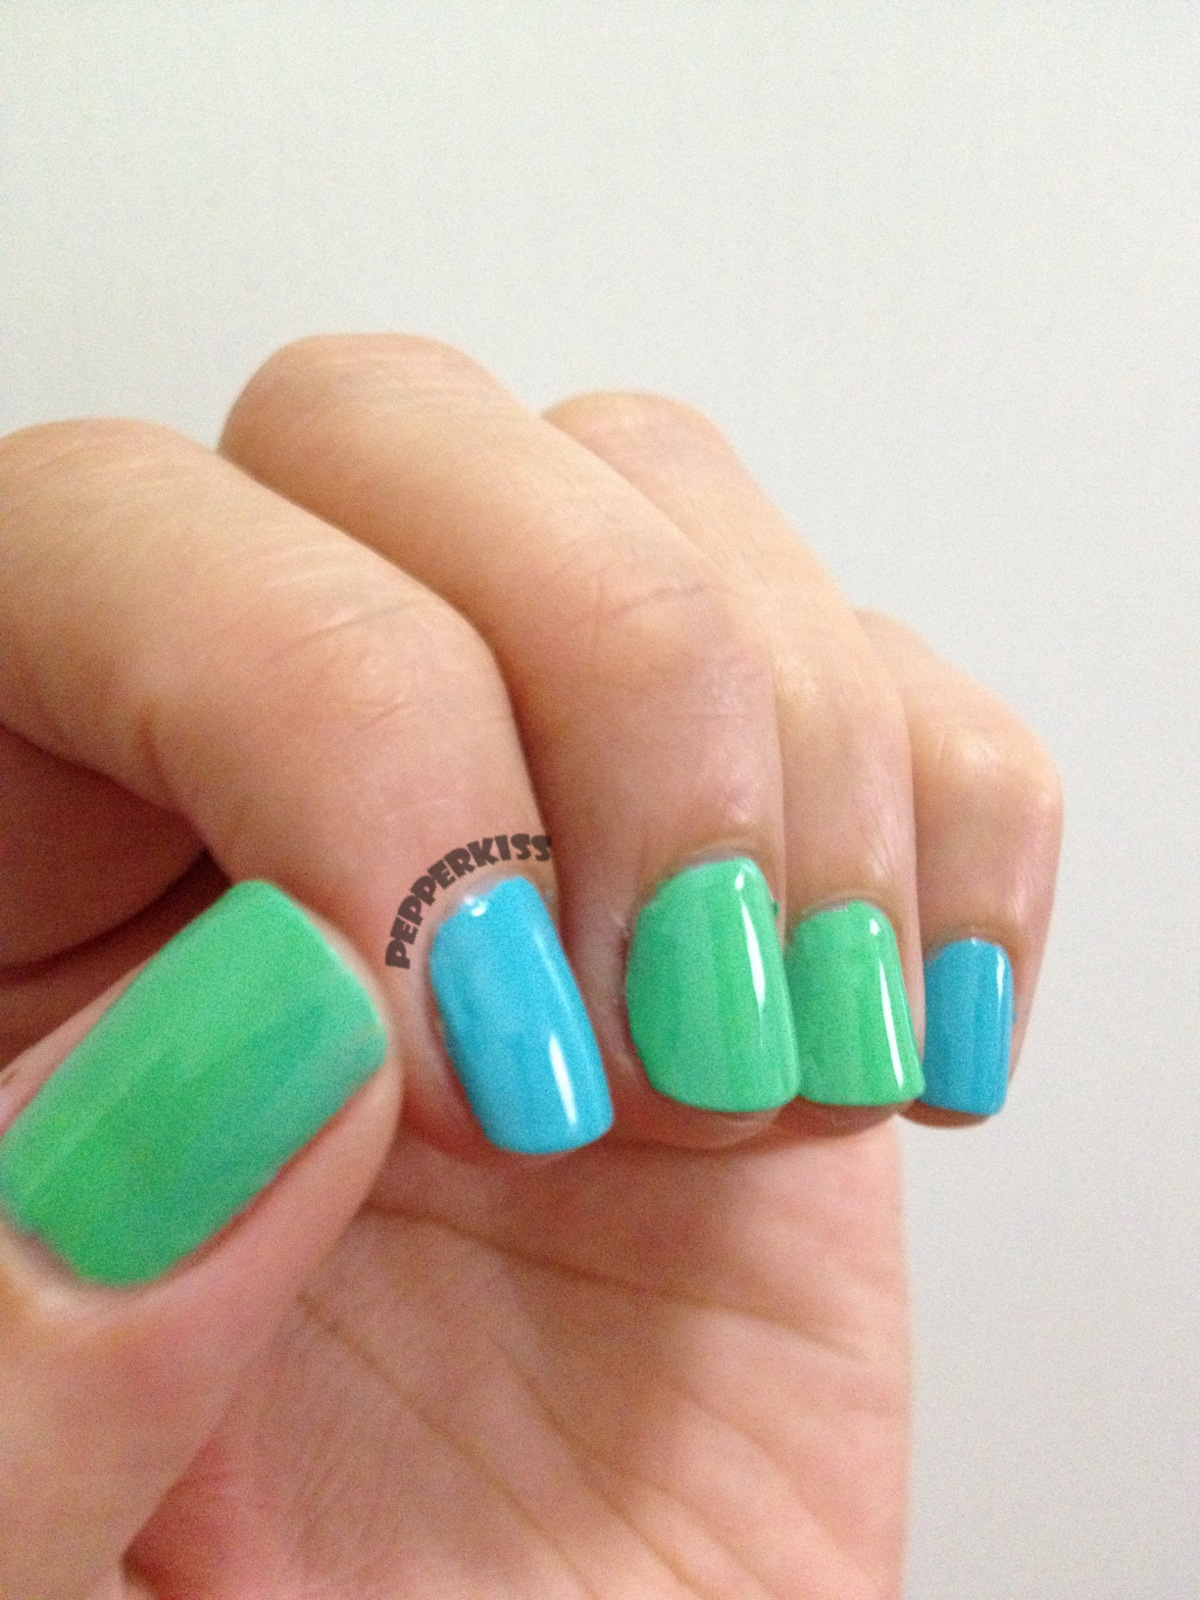 Swallow nail art design! | ilovenailart ✿♥‿♥✿